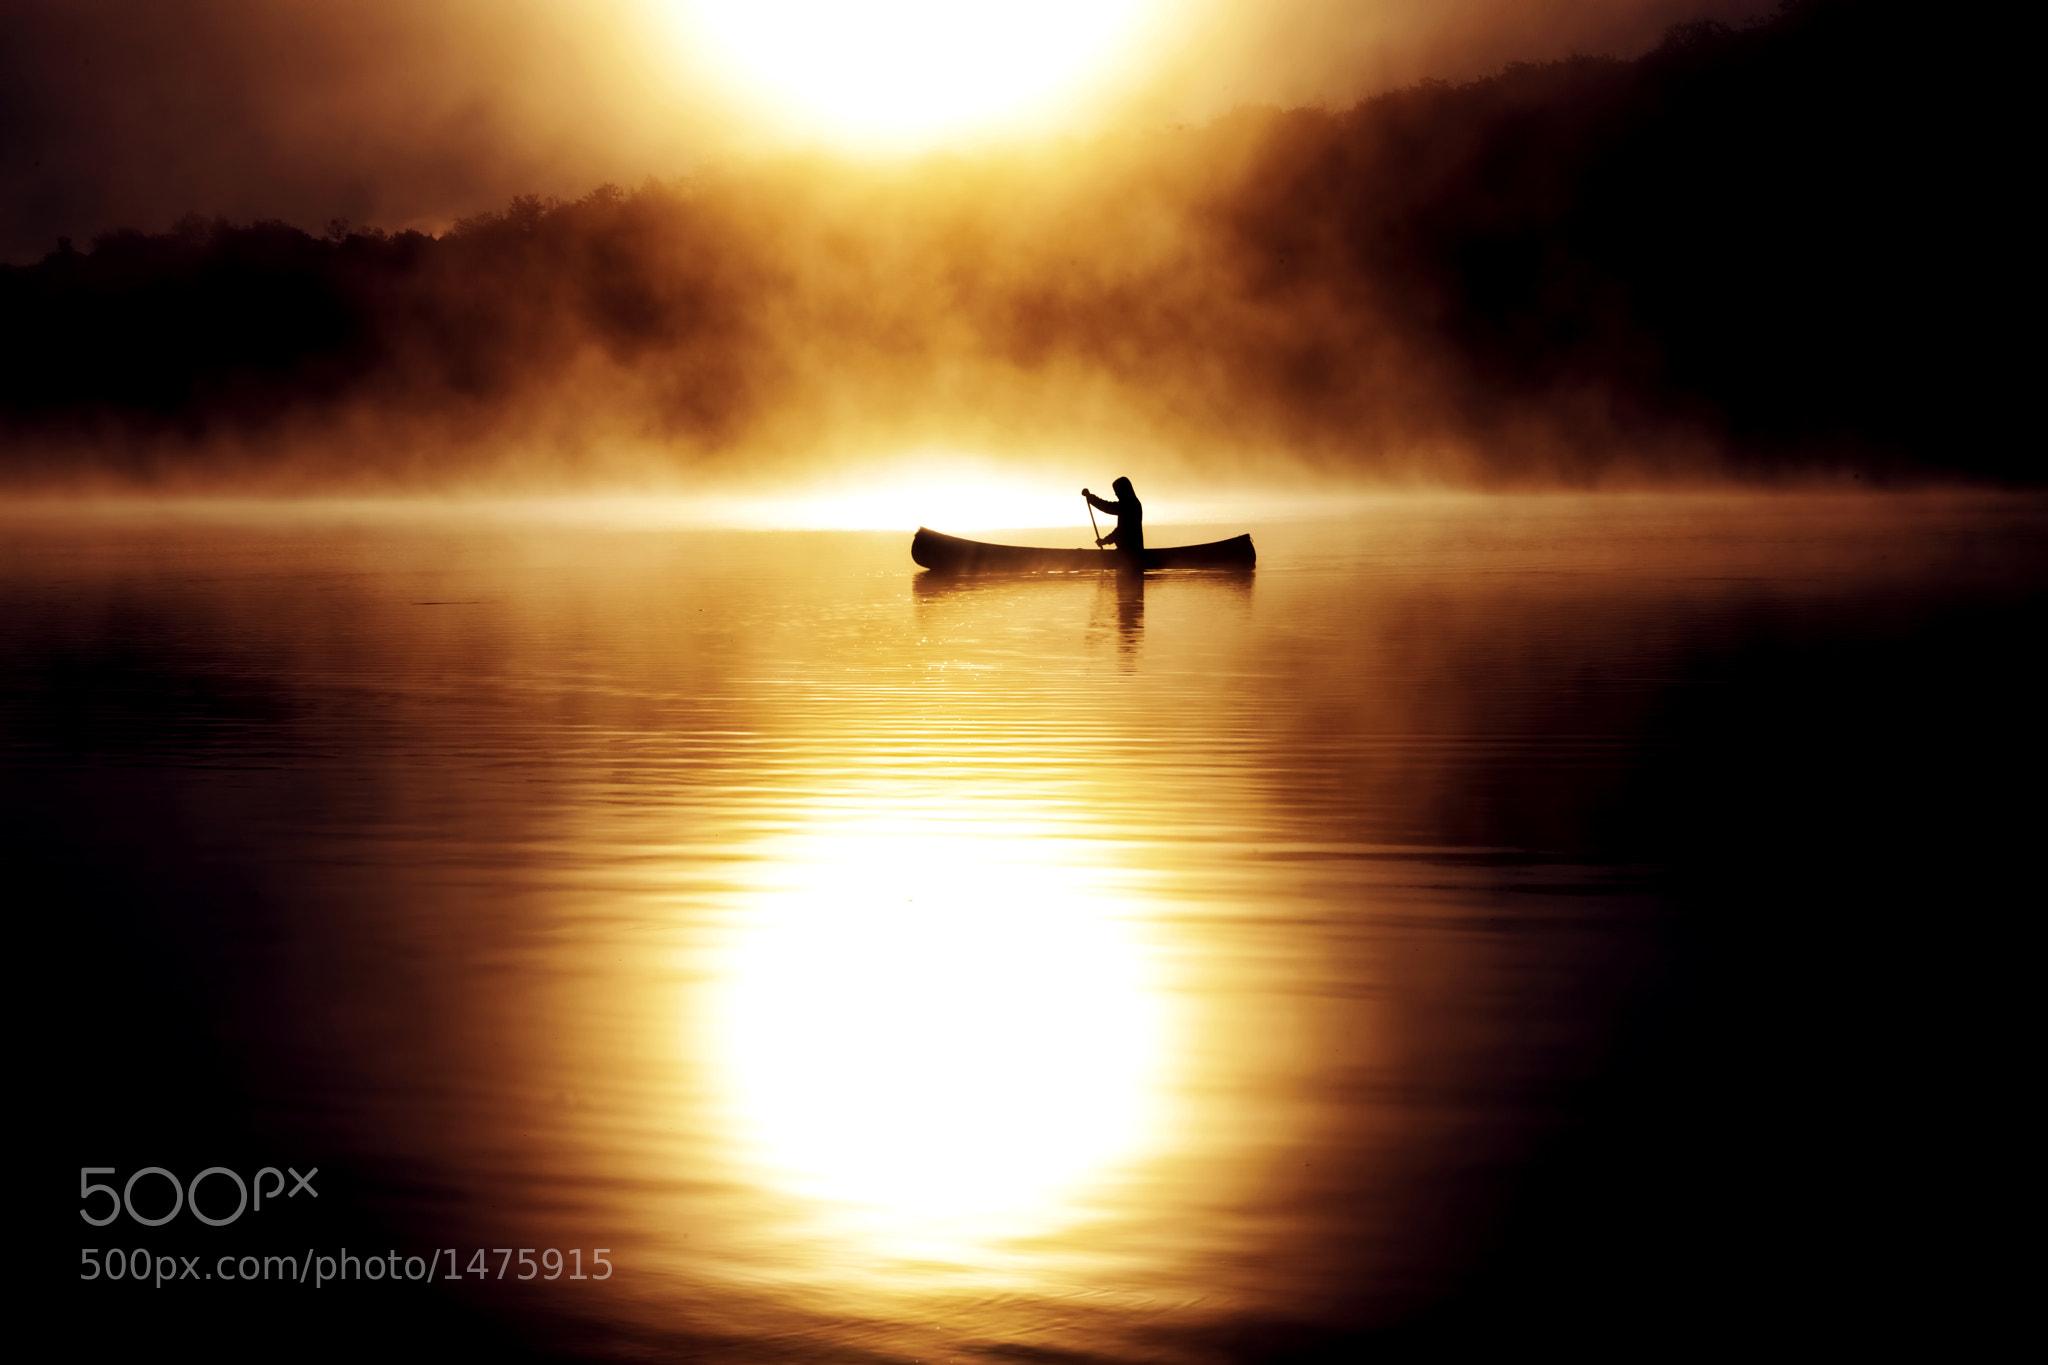 Photograph Burning Canoe by Robin B. Powell on 500px